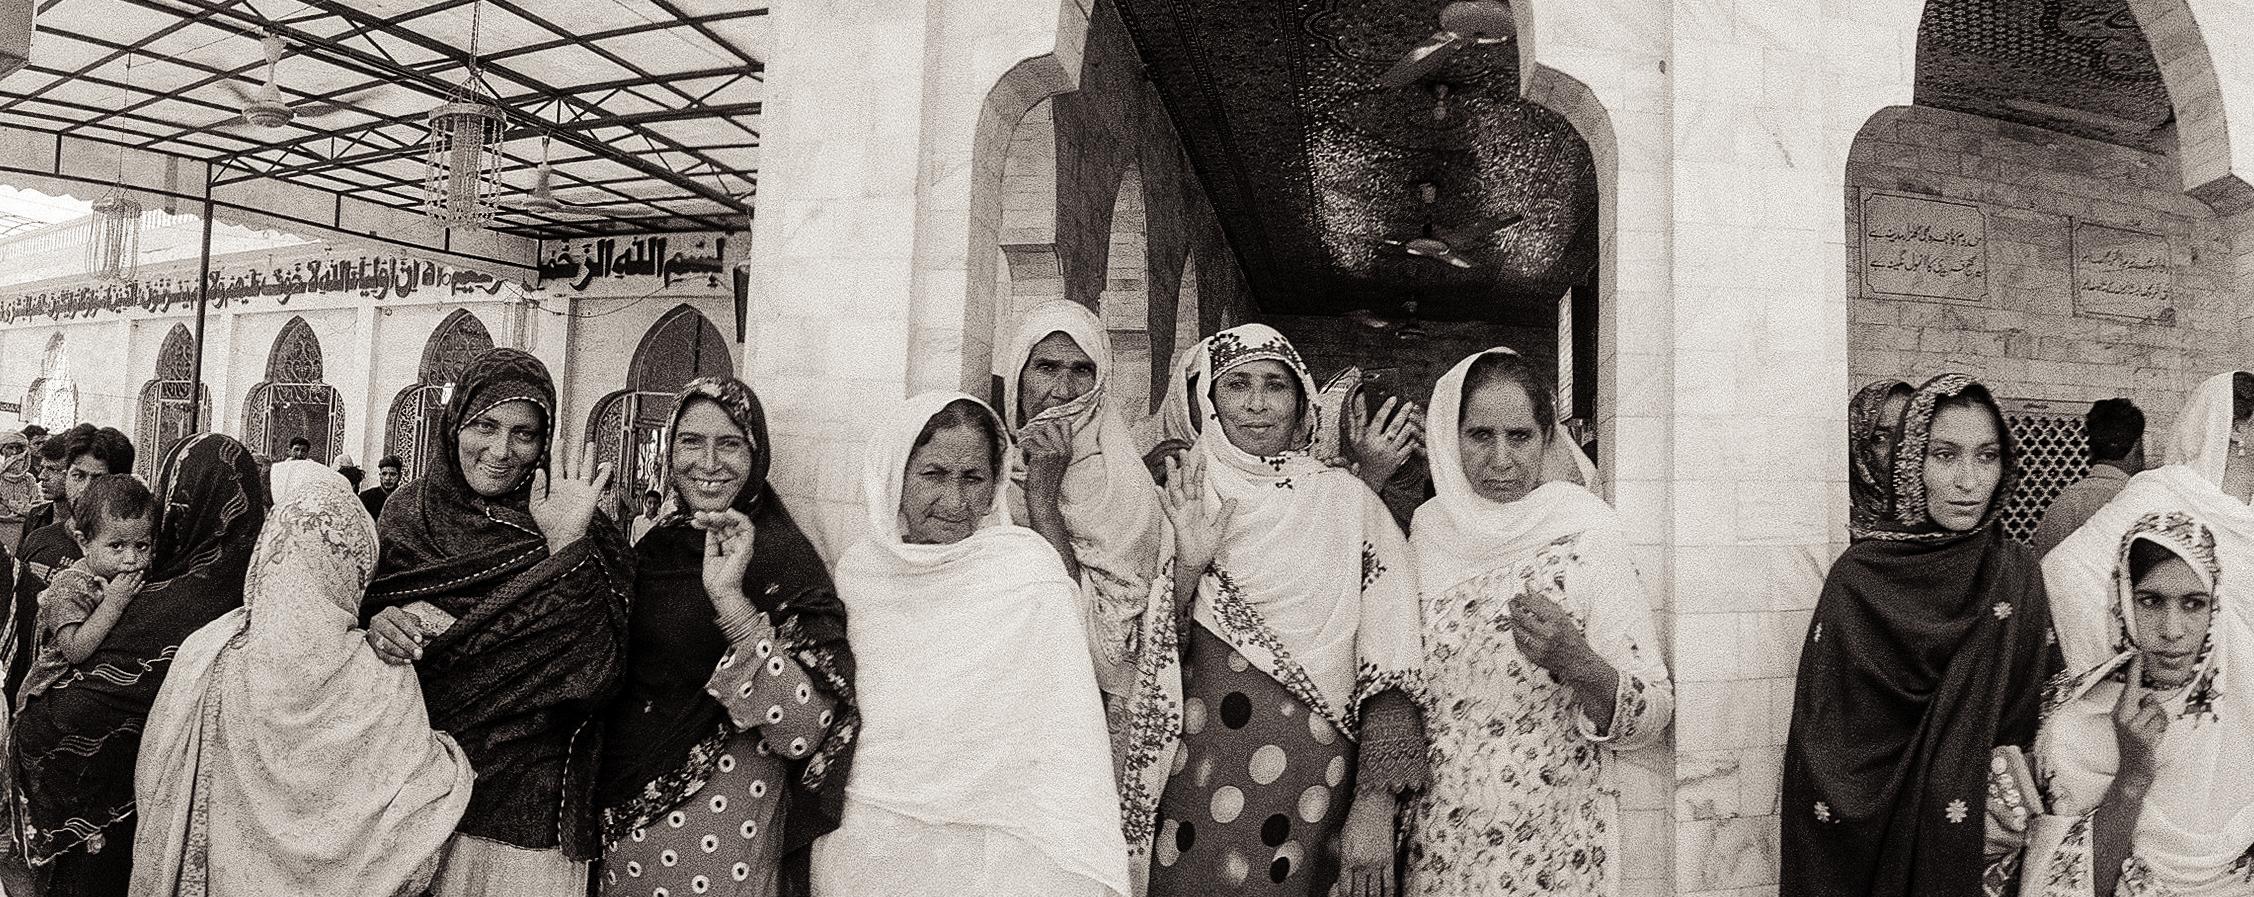 Ladies visiting a shrine in Pakpattan Photo by AK Sandhu